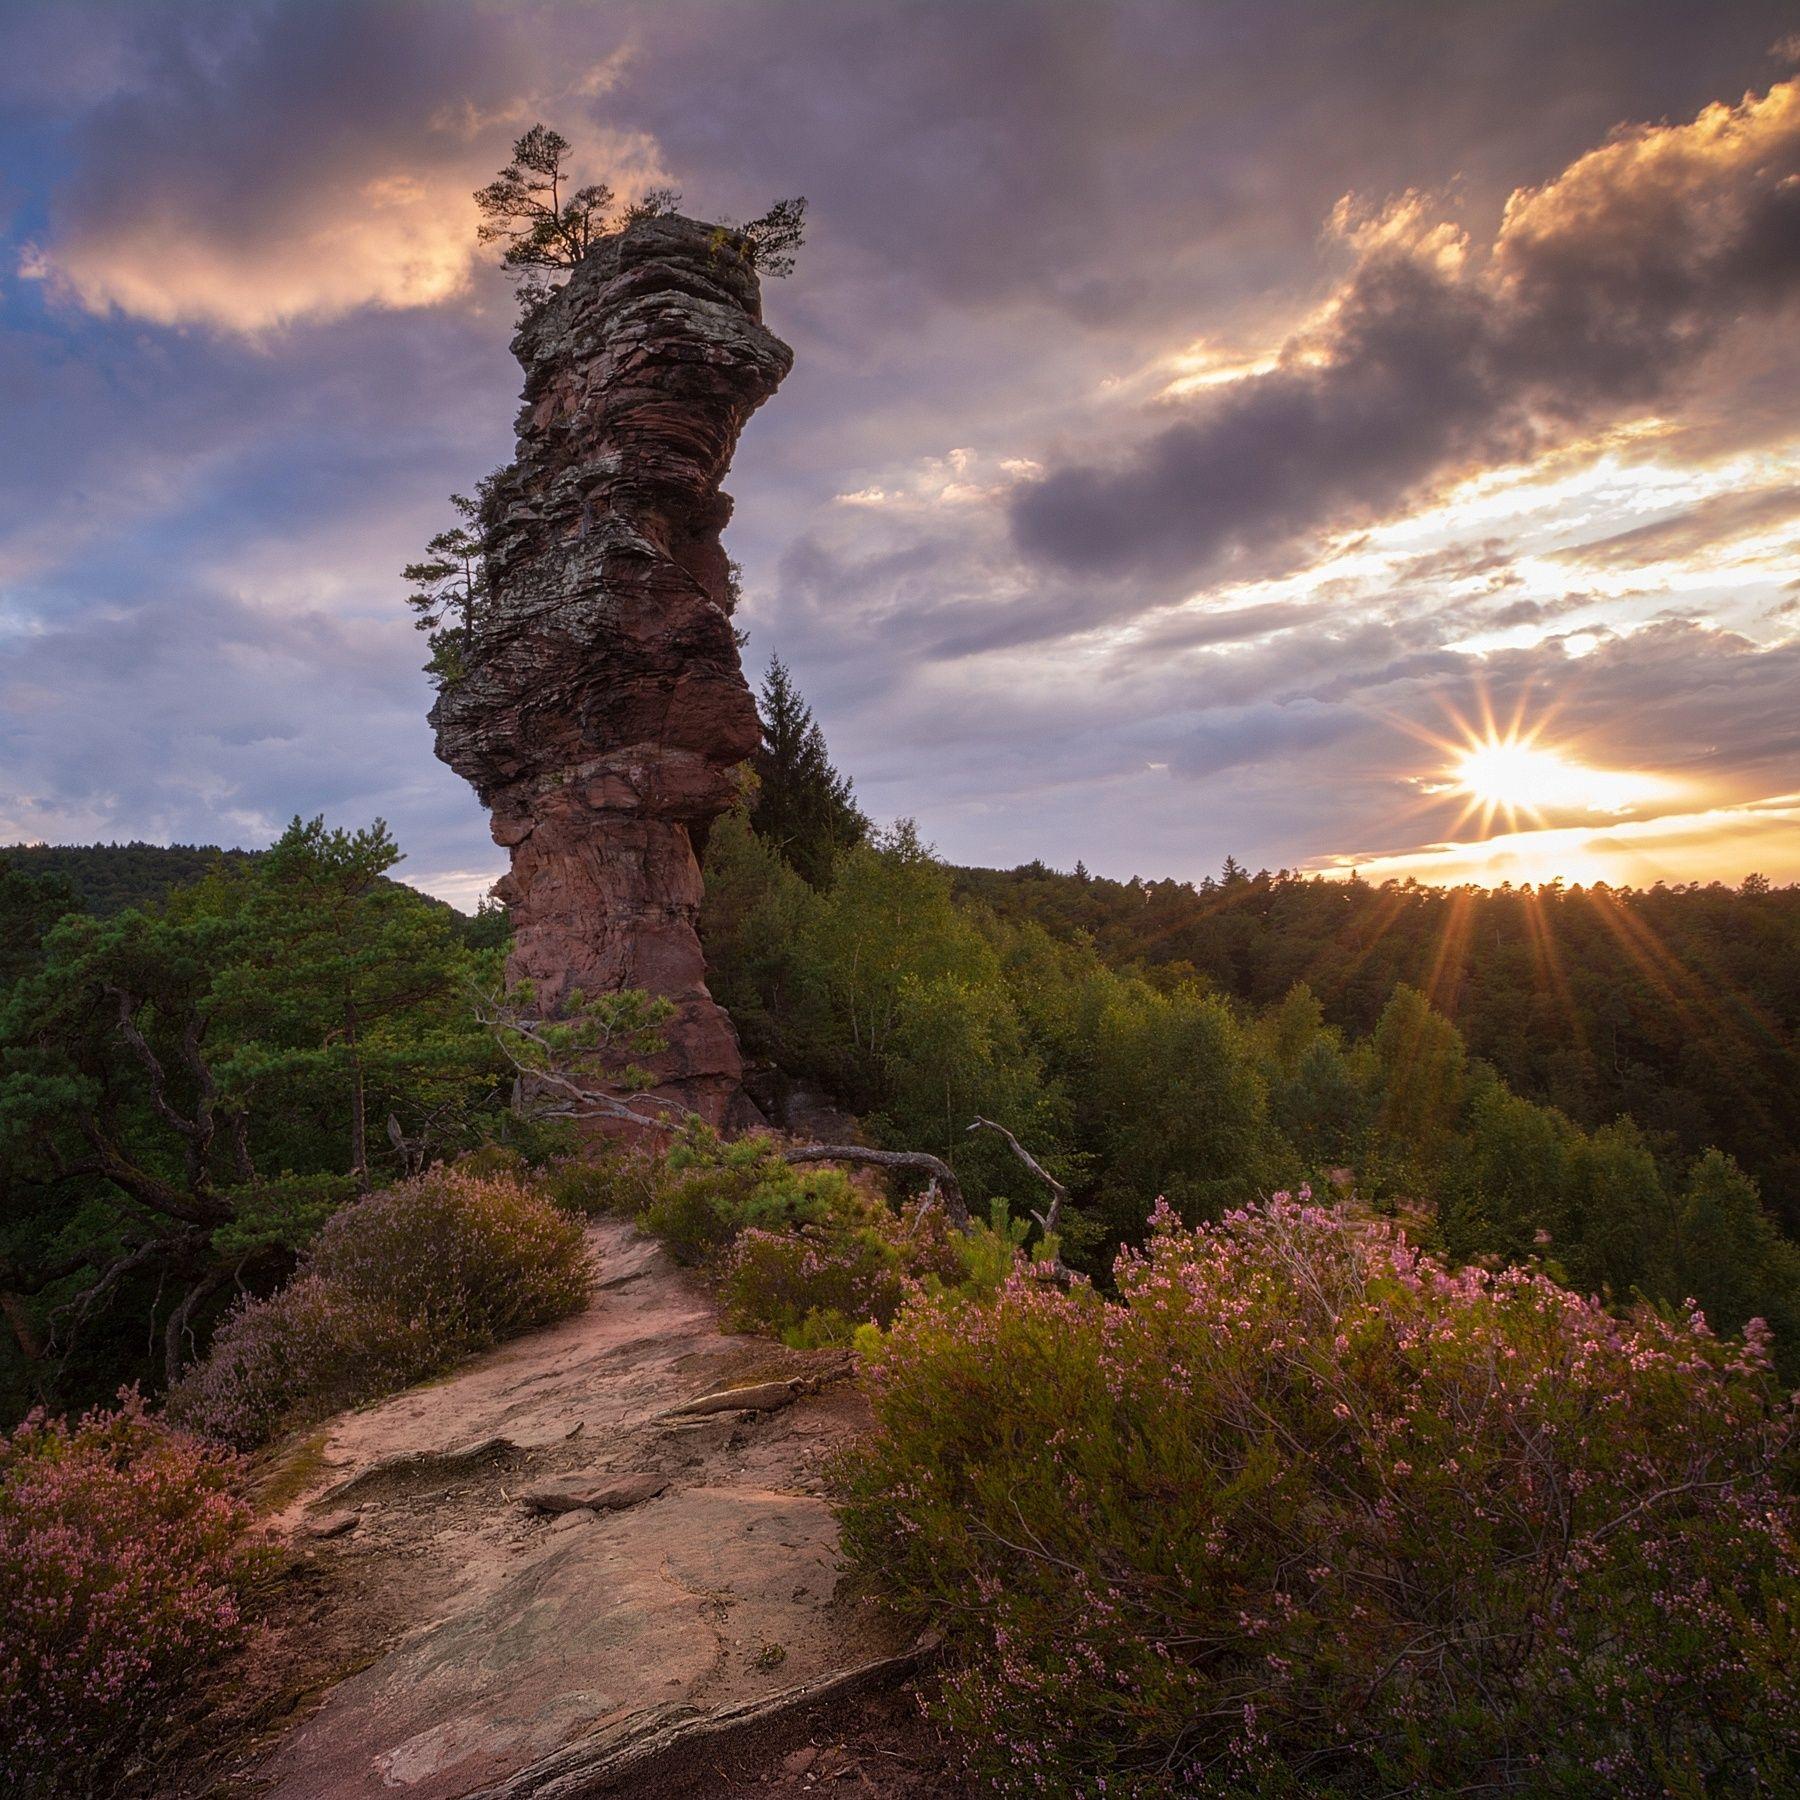 Lämmerfelsen bei Sonnenuntergang Dahner Felsenland ...